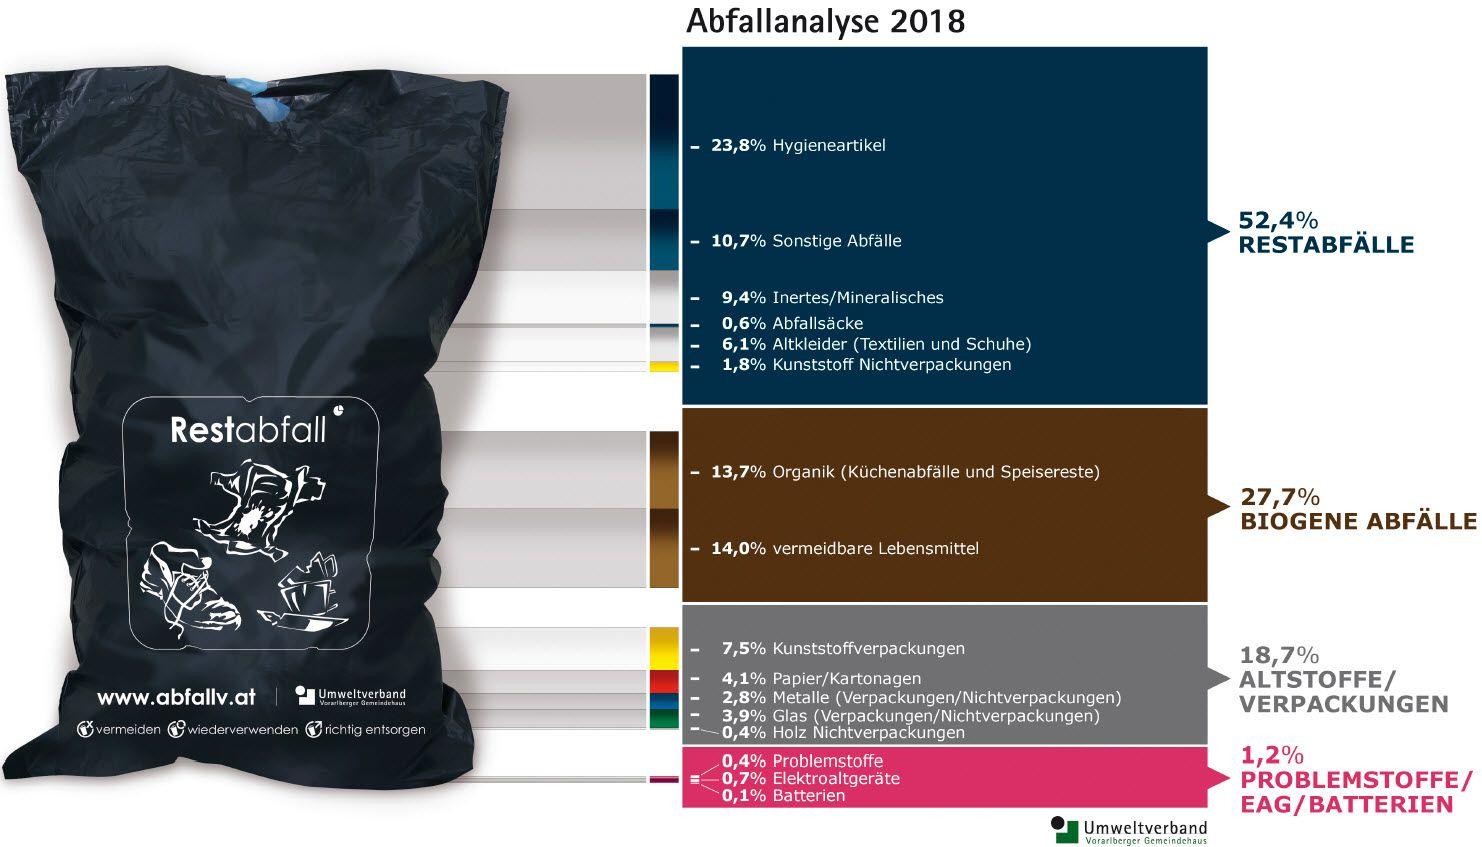 Abfallanalyse